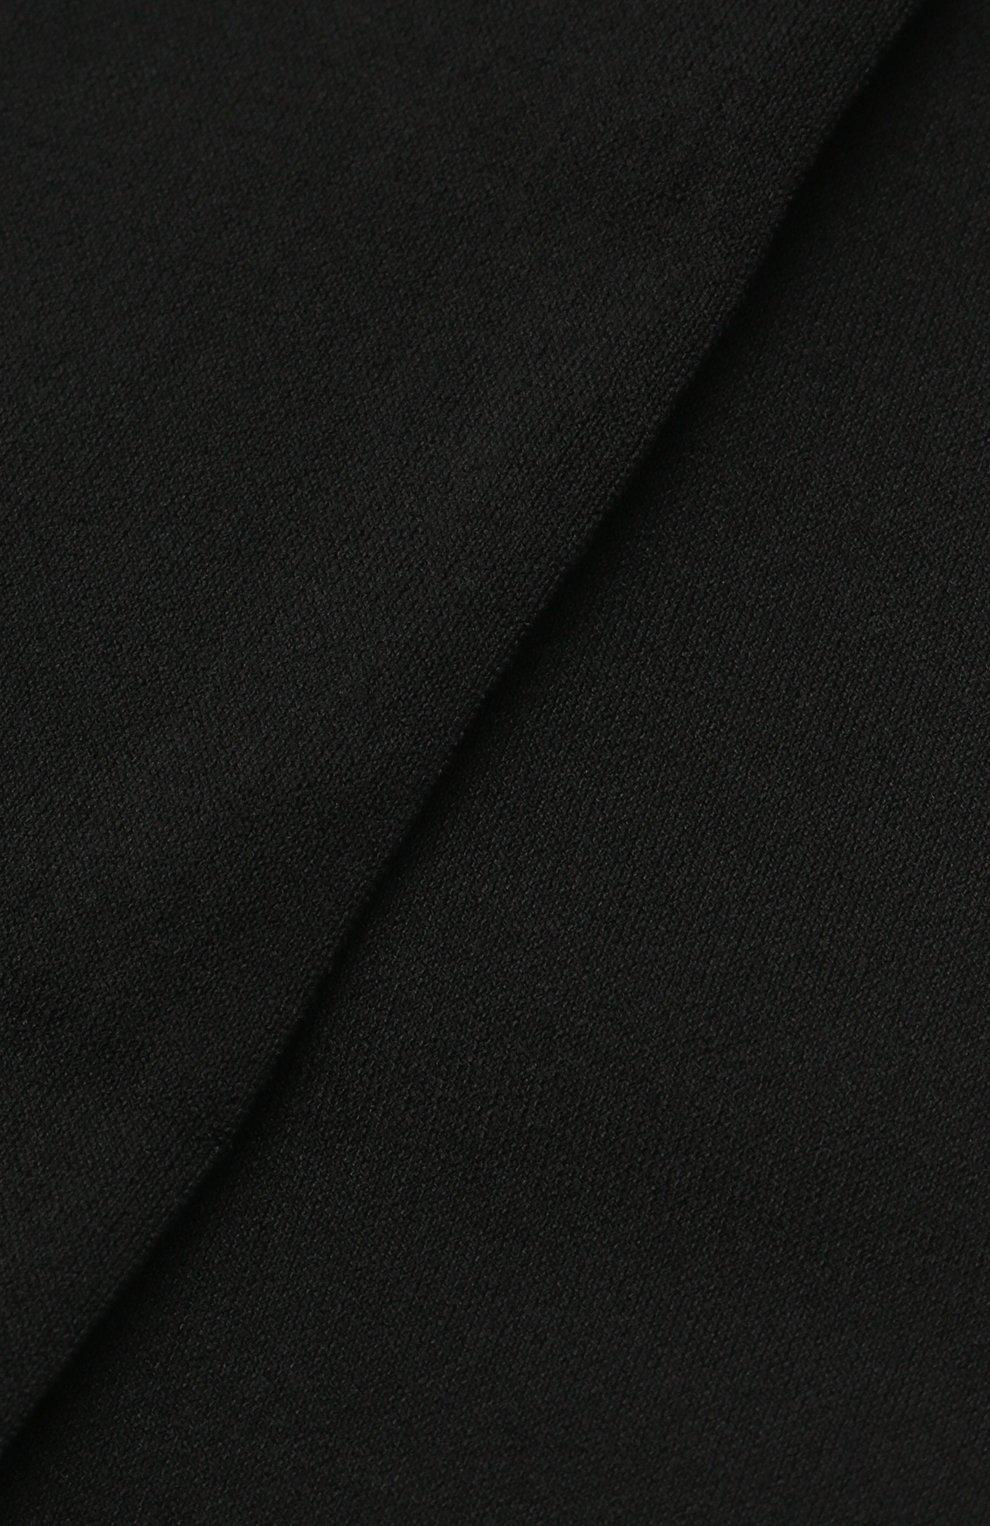 Детские колготки LA PERLA черного цвета, арт. 46105/7-8   Фото 2 (Материал: Текстиль)